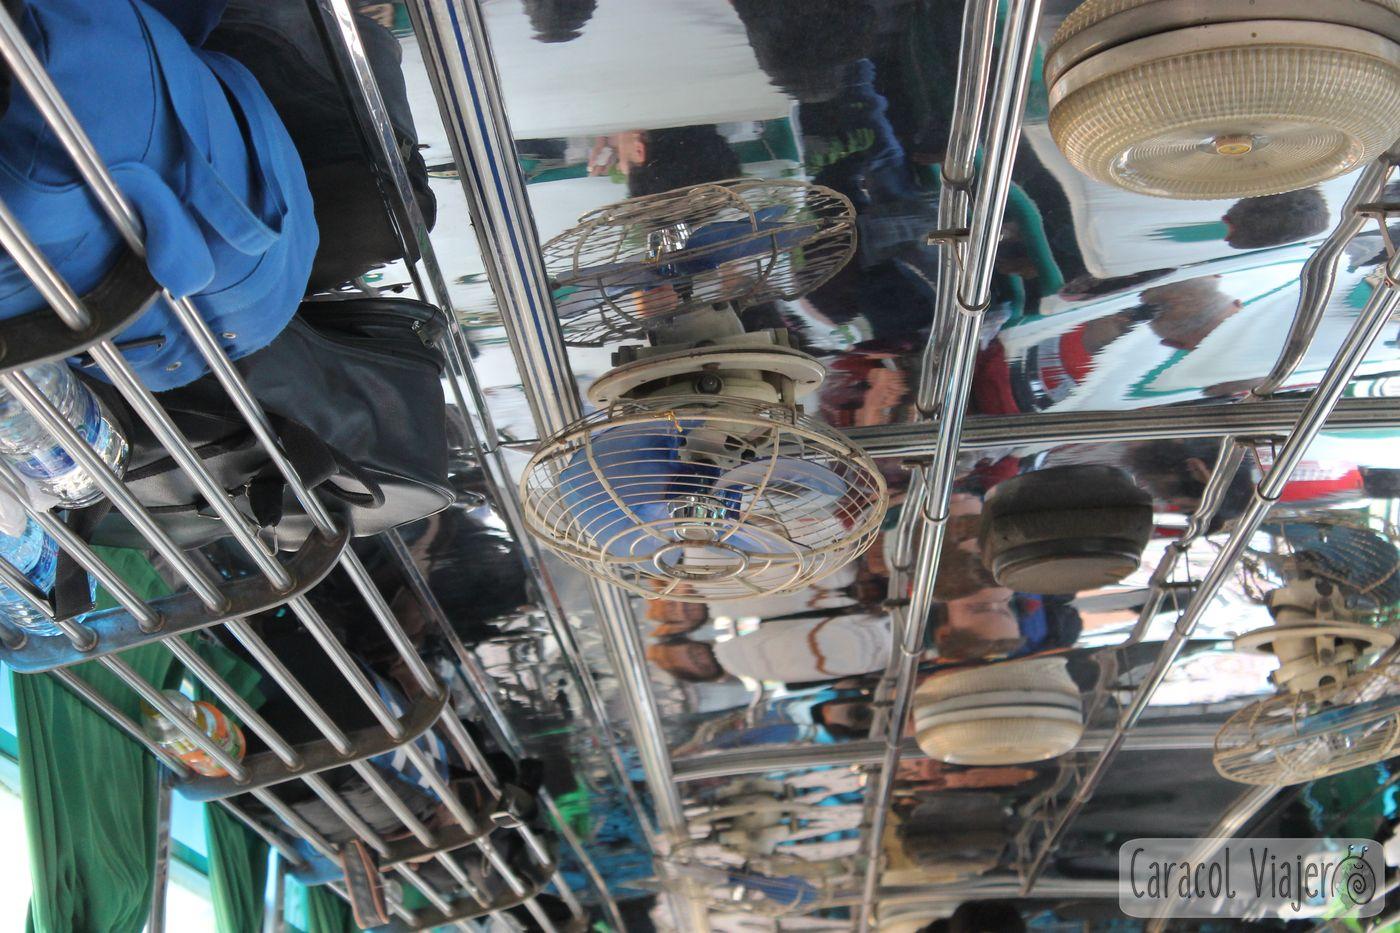 Ventiladores autobuses Tailandia